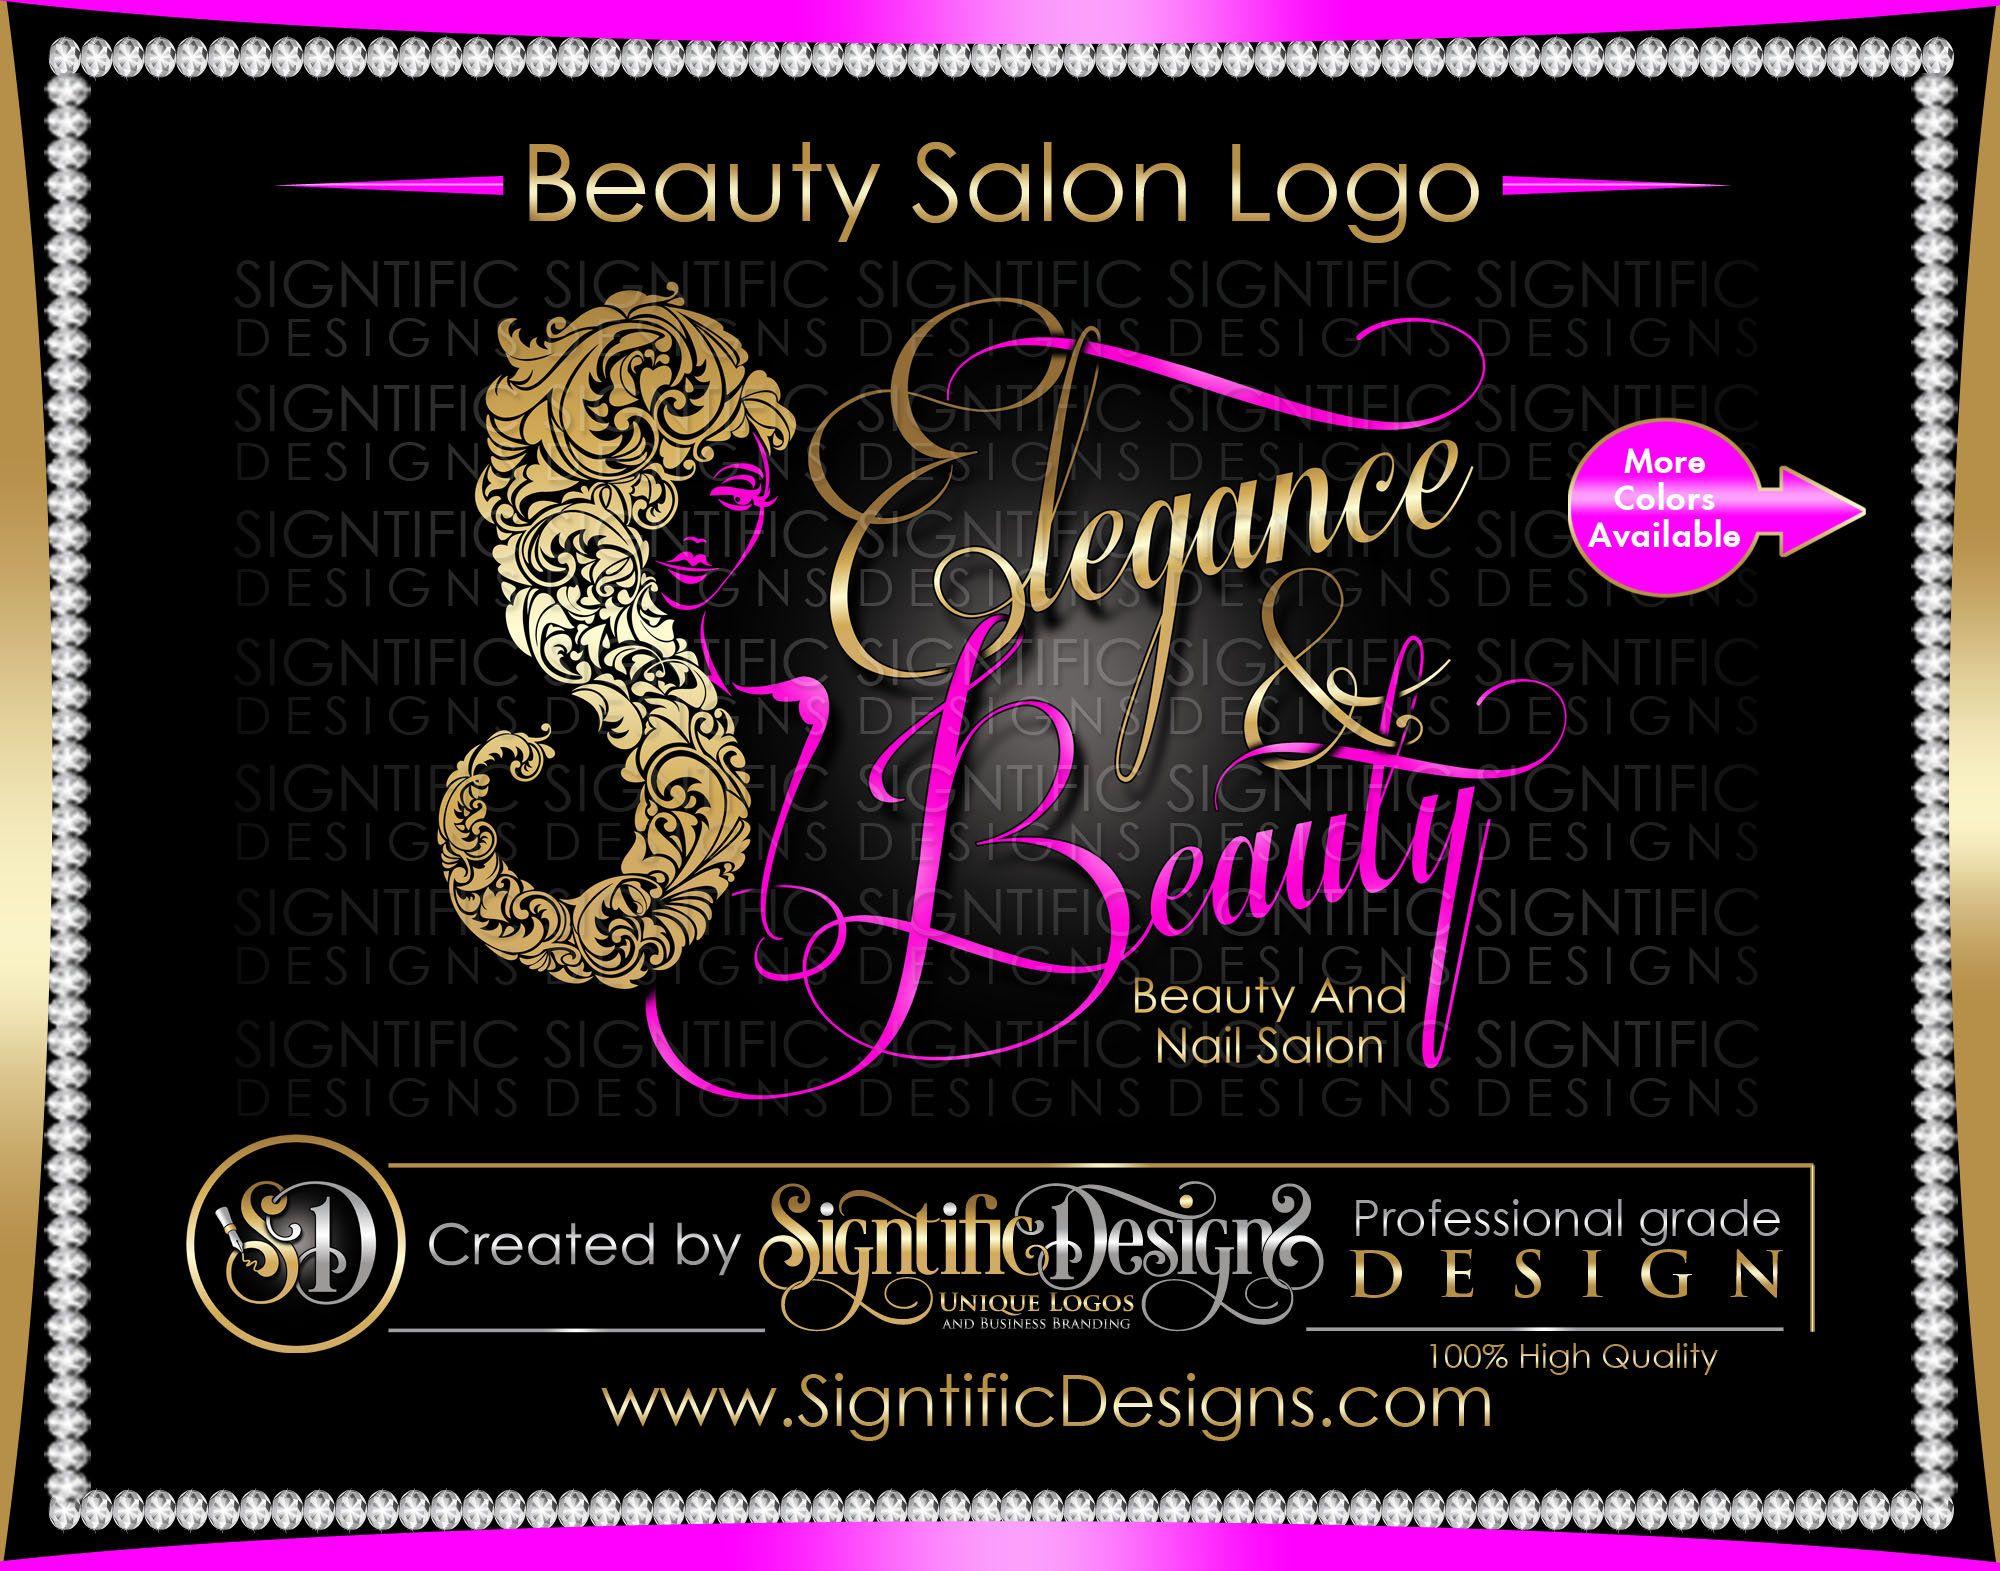 Beauty and Nail Salon Logo, Custom Business Logo, Silver